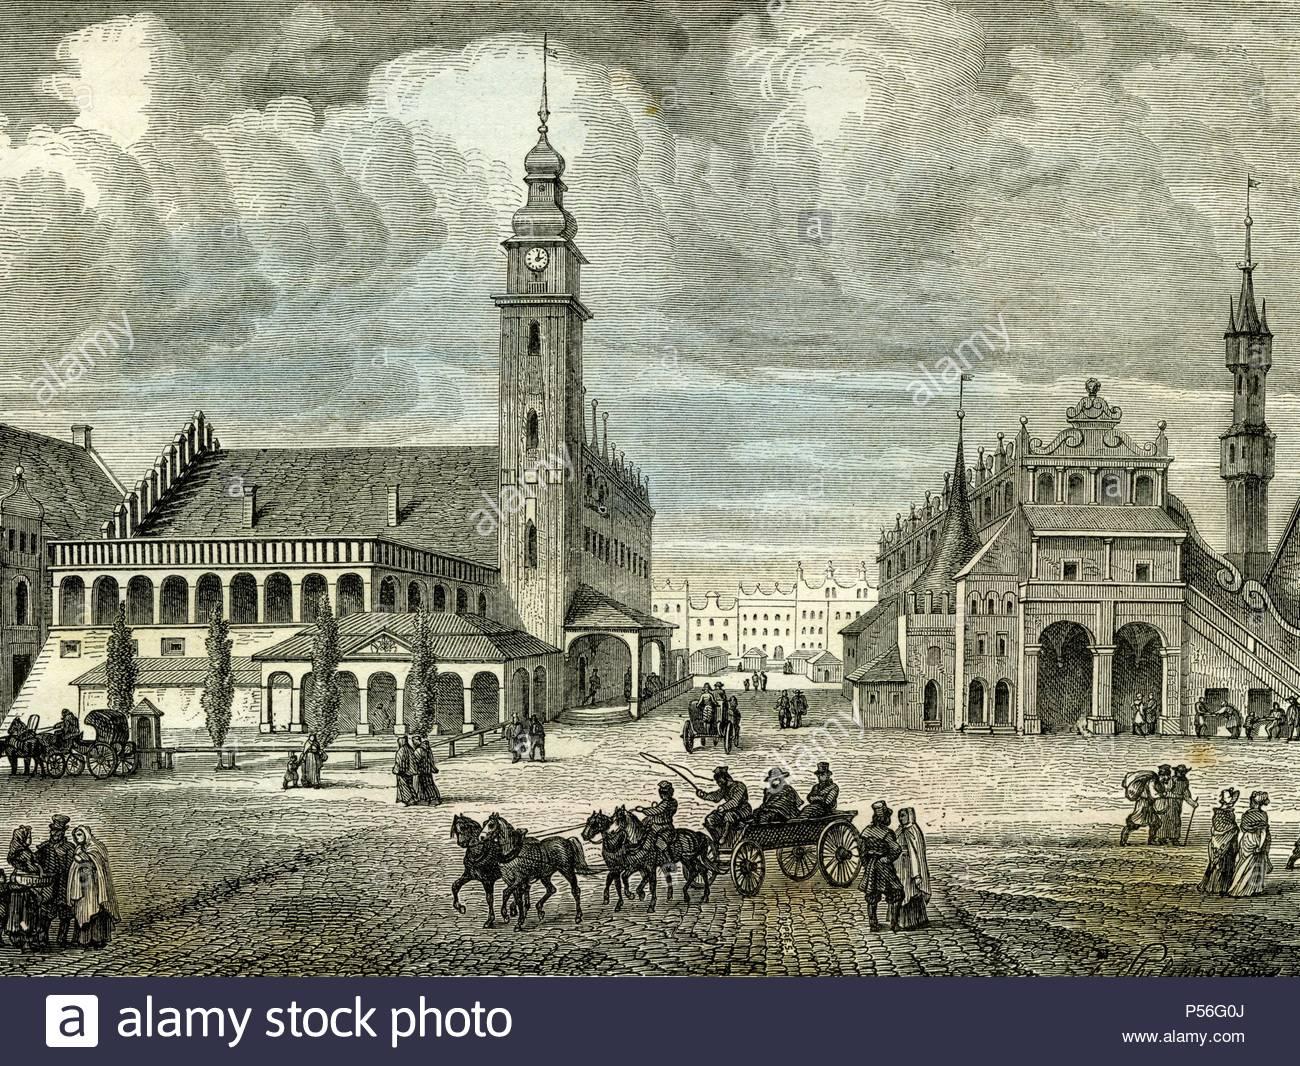 Krakow, Cracovie, Poland, 19th century. - Stock Image